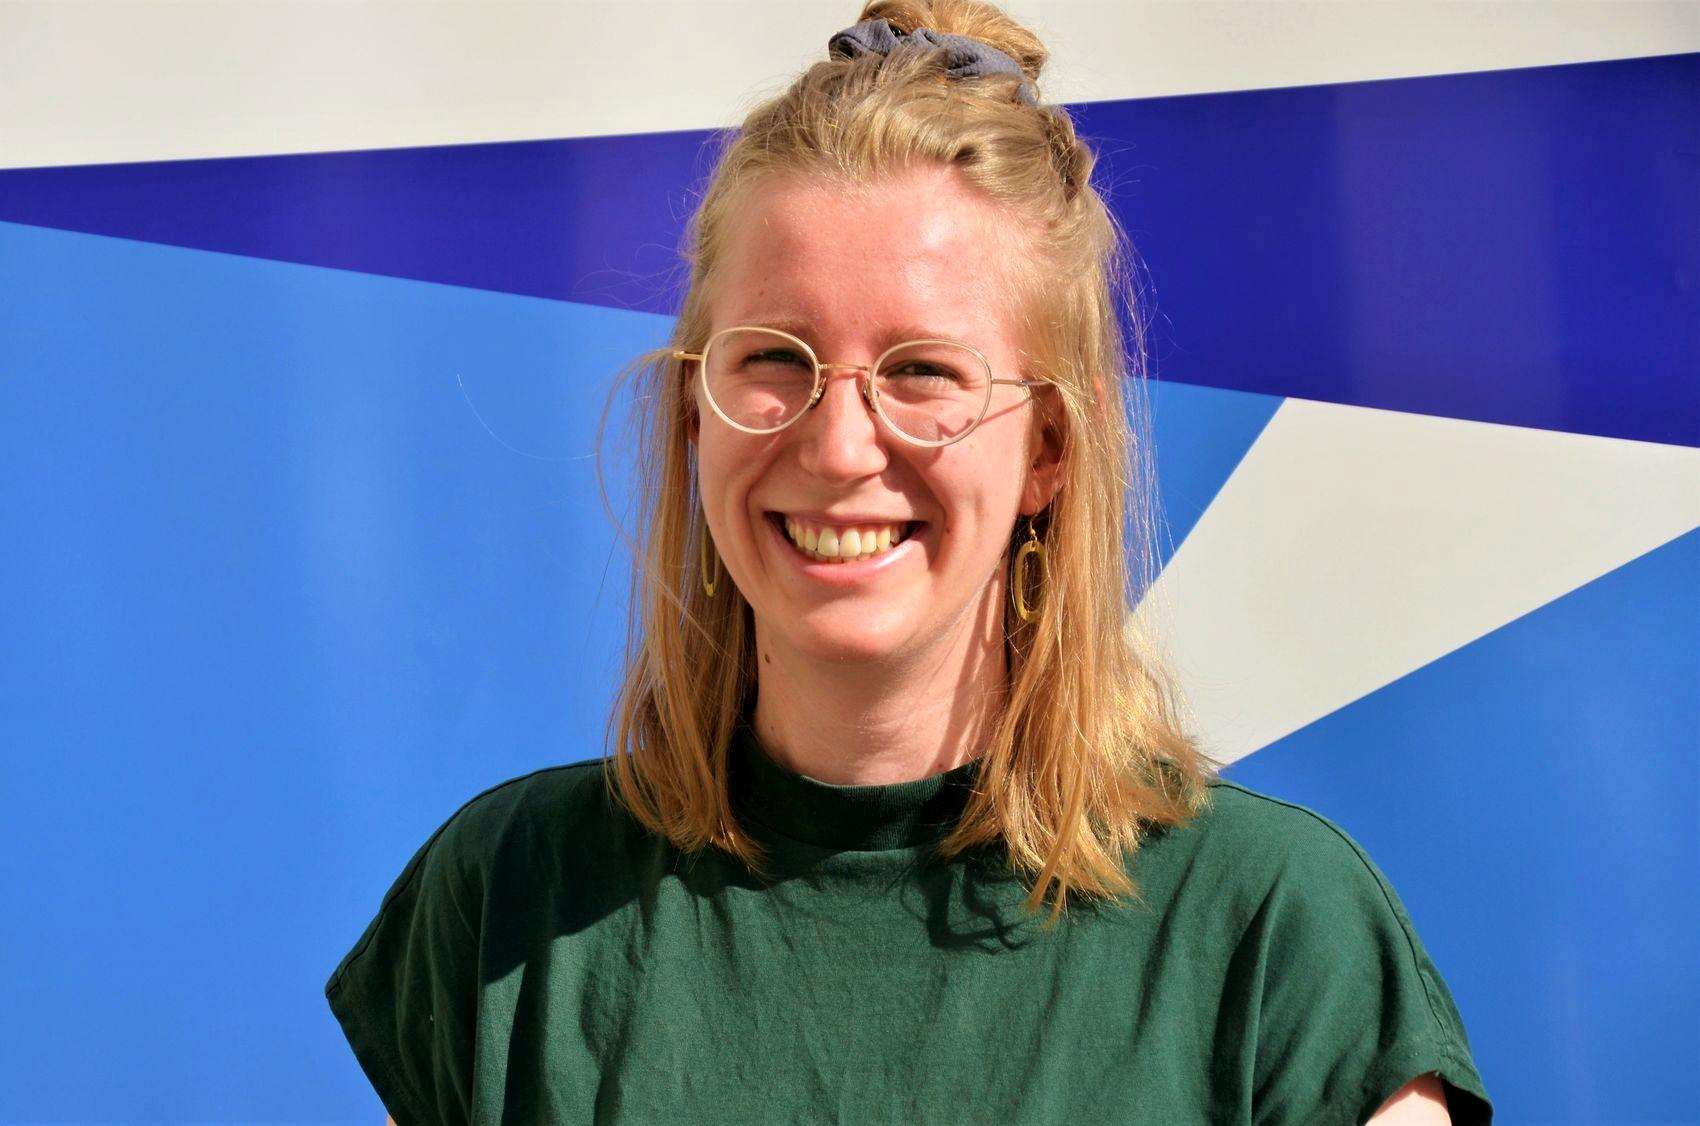 Marie Baumgarten